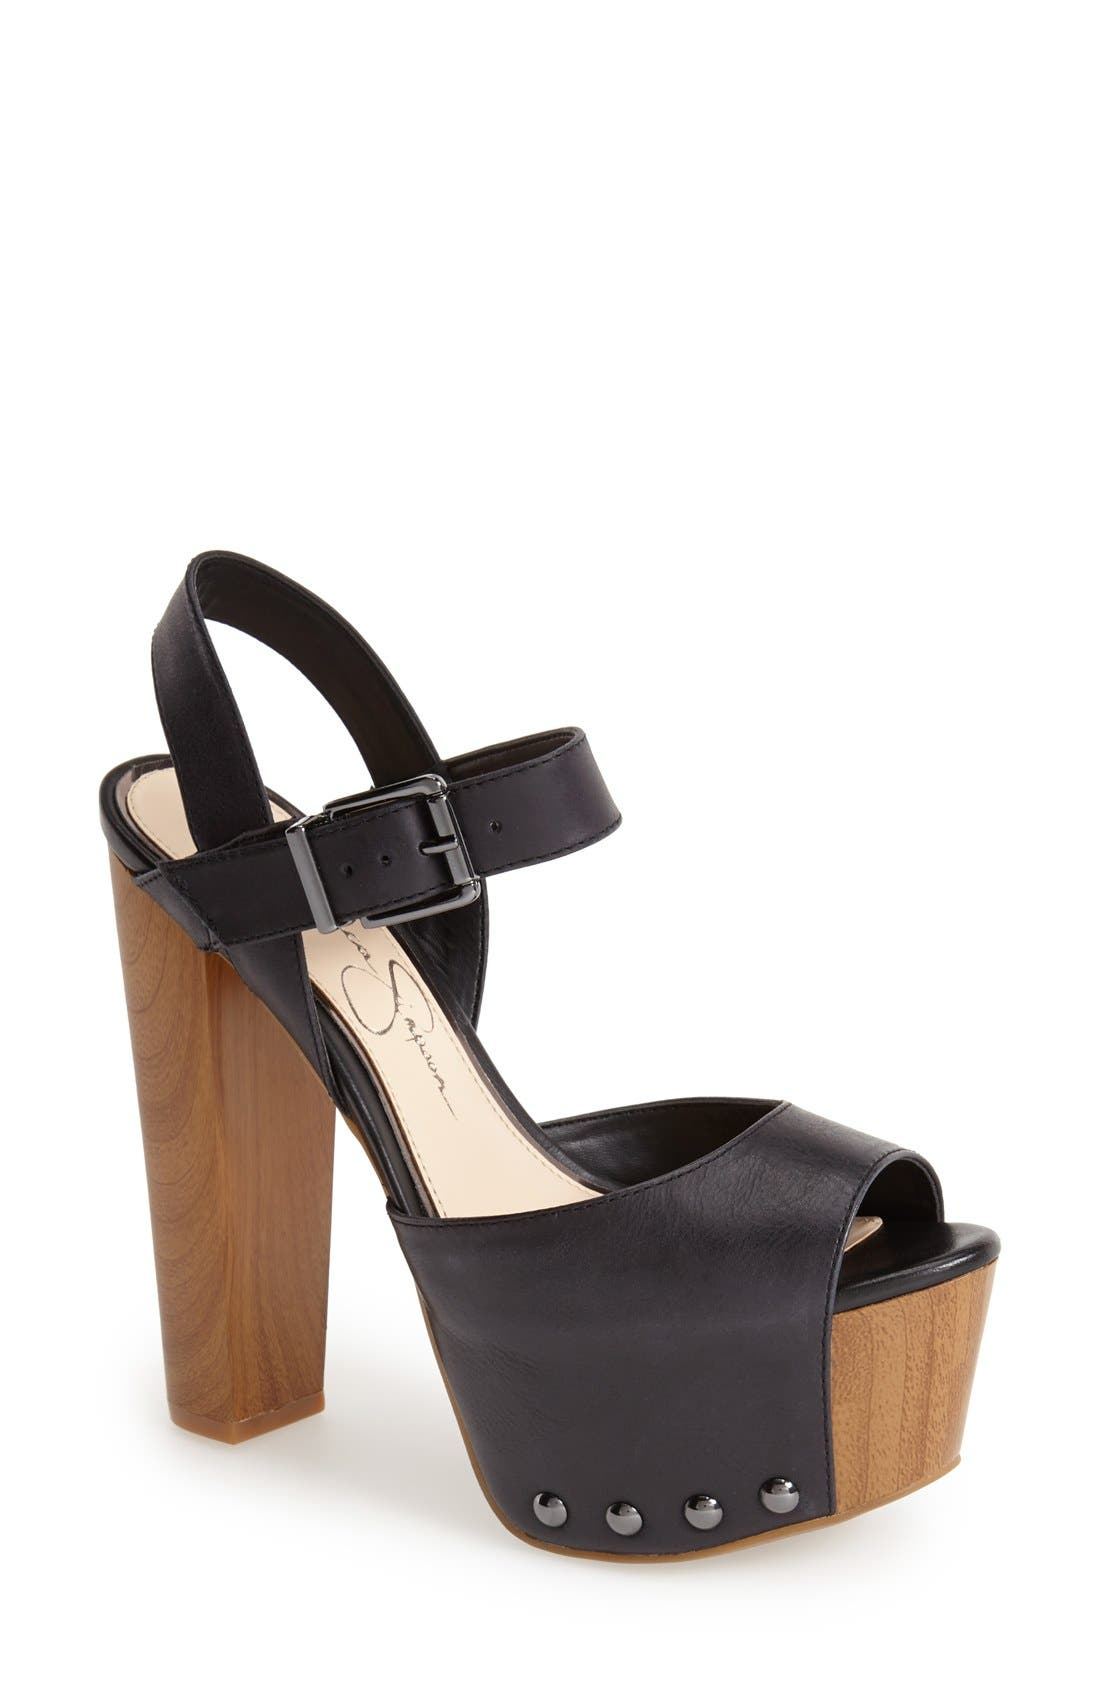 Main Image - Jessica Simpson 'Daelyn' Studded Leather Platform Sandal (Women)